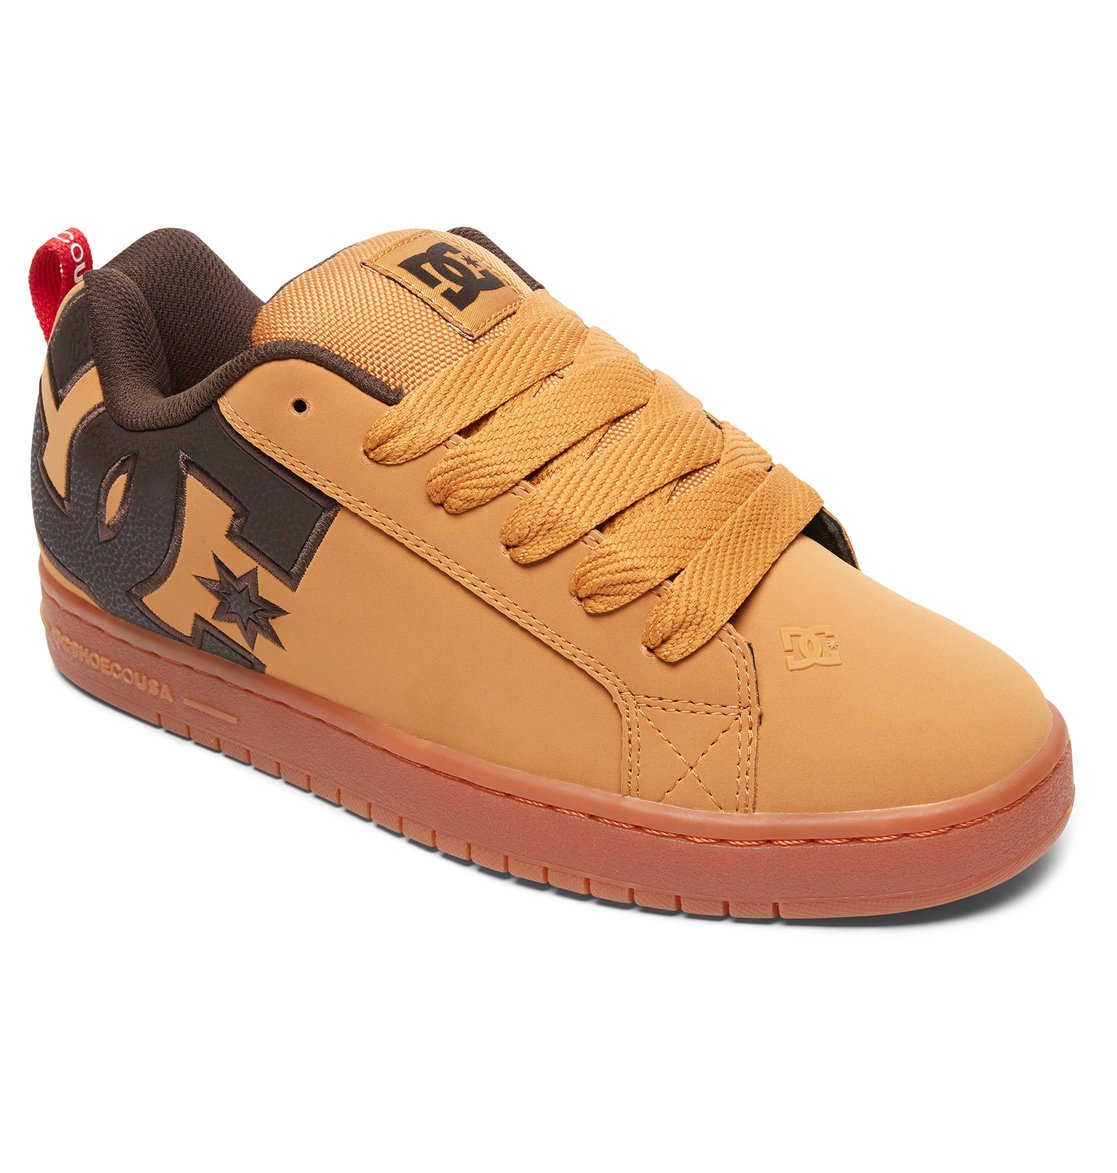 1 Court Graffik SE - Scarpe da Uomo Brown 300927 DC Shoes 7de34cbd3be